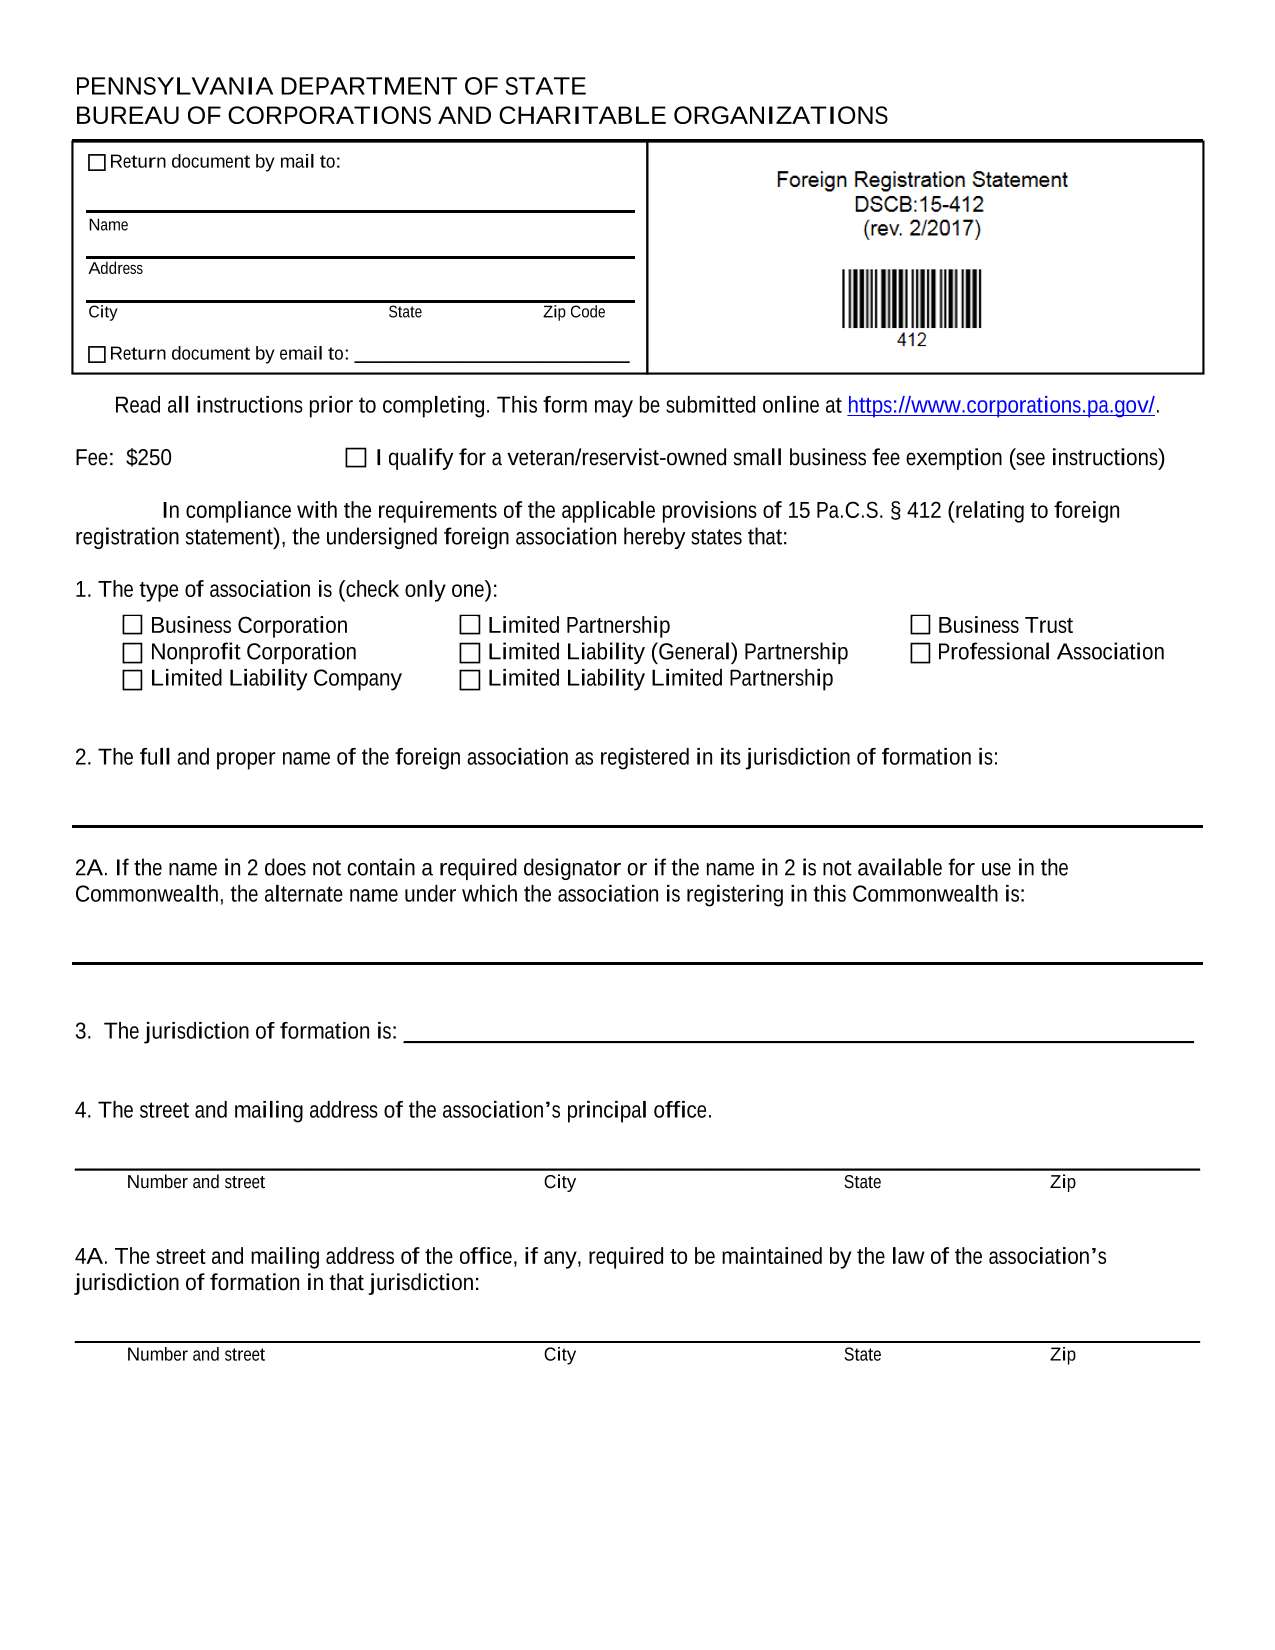 pennsylvania-foreign-llc-application-for-registration